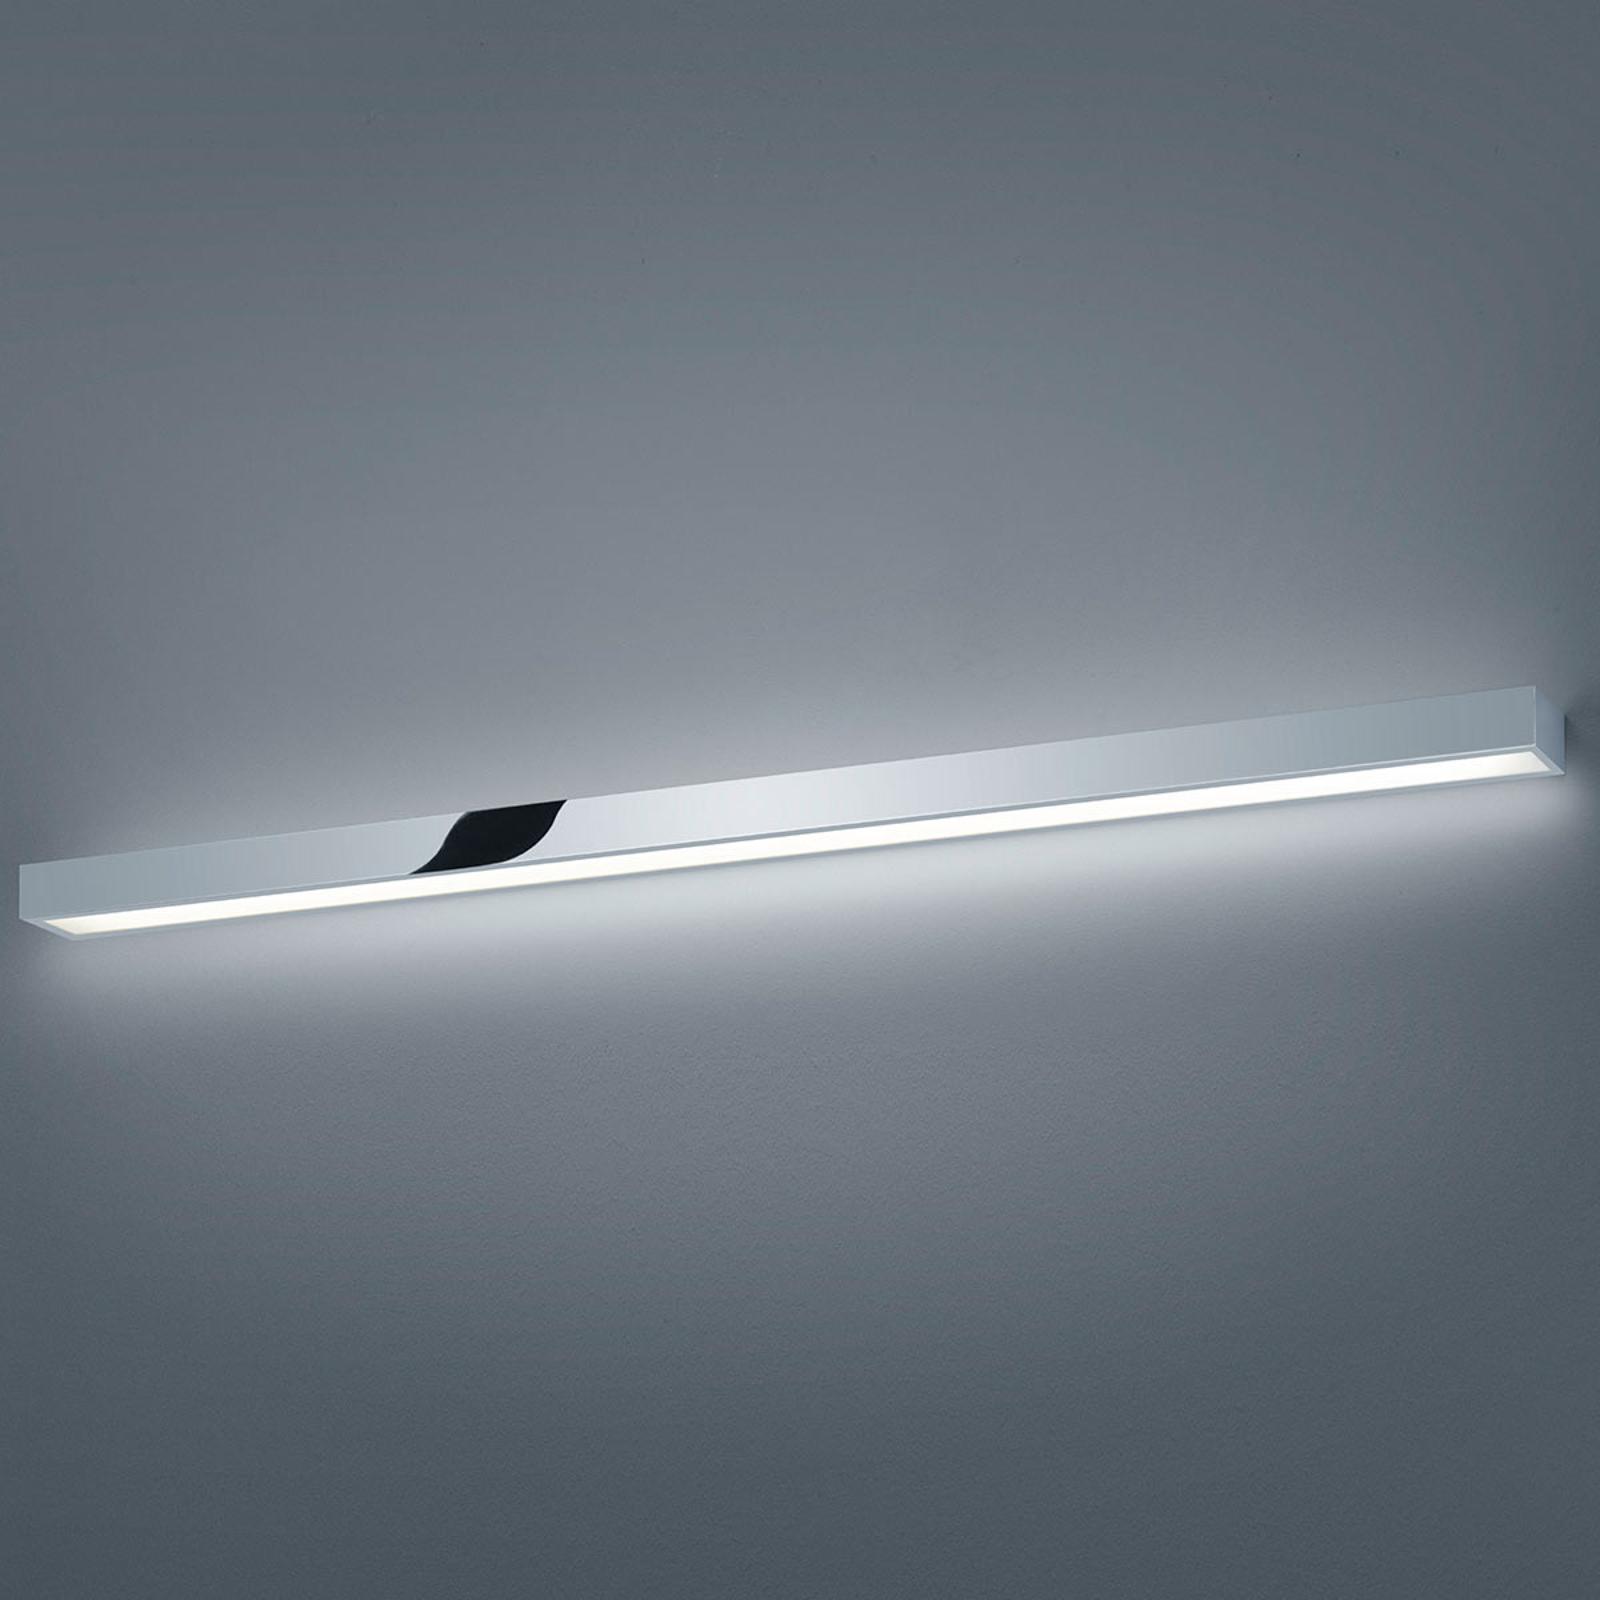 Helestra Theia LED-Spiegelleuchte, verchromt 120cm